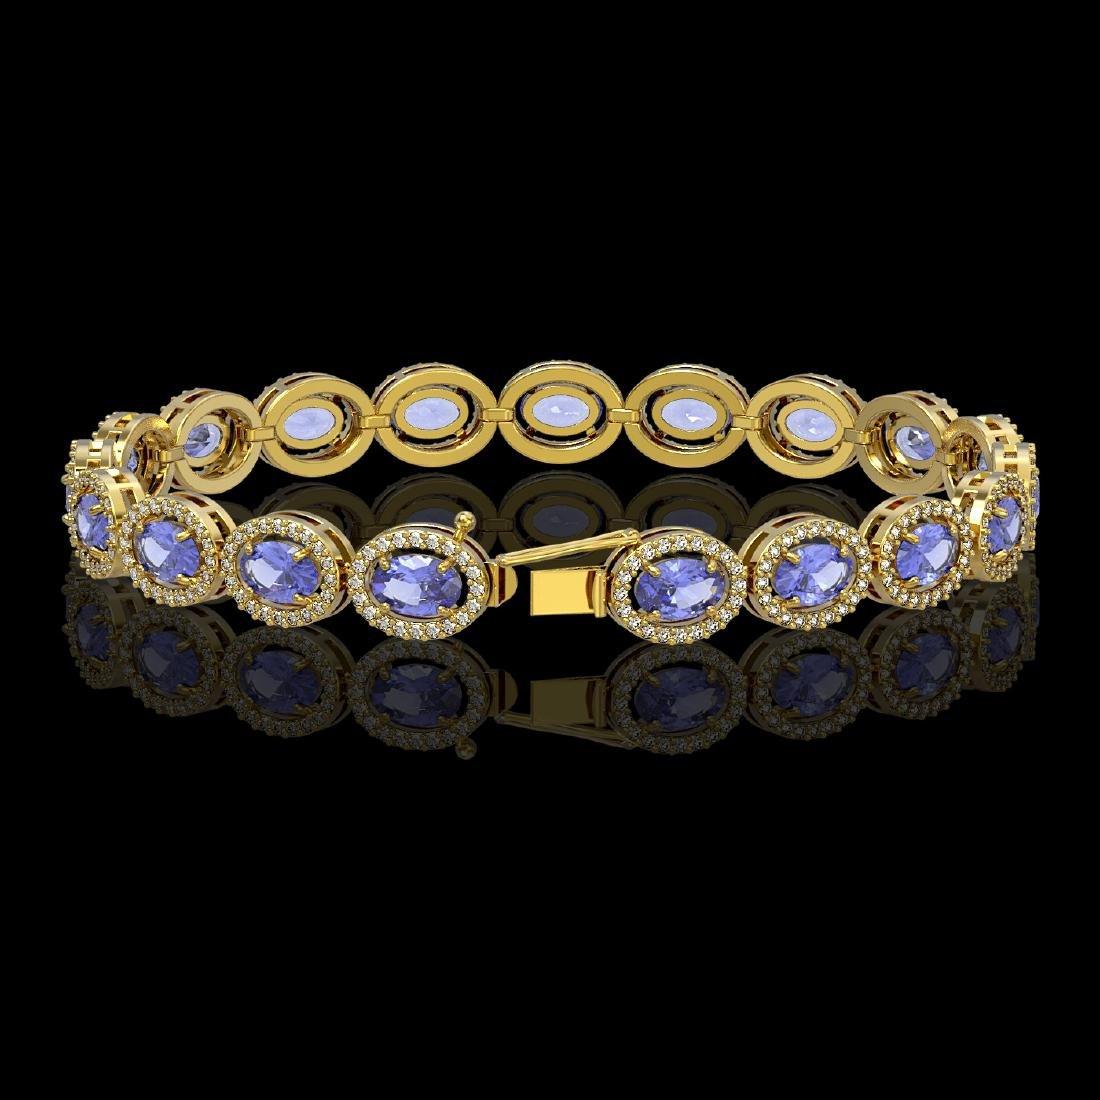 14.25 CTW Tanzanite & Diamond Halo Bracelet 10K Yellow - 2